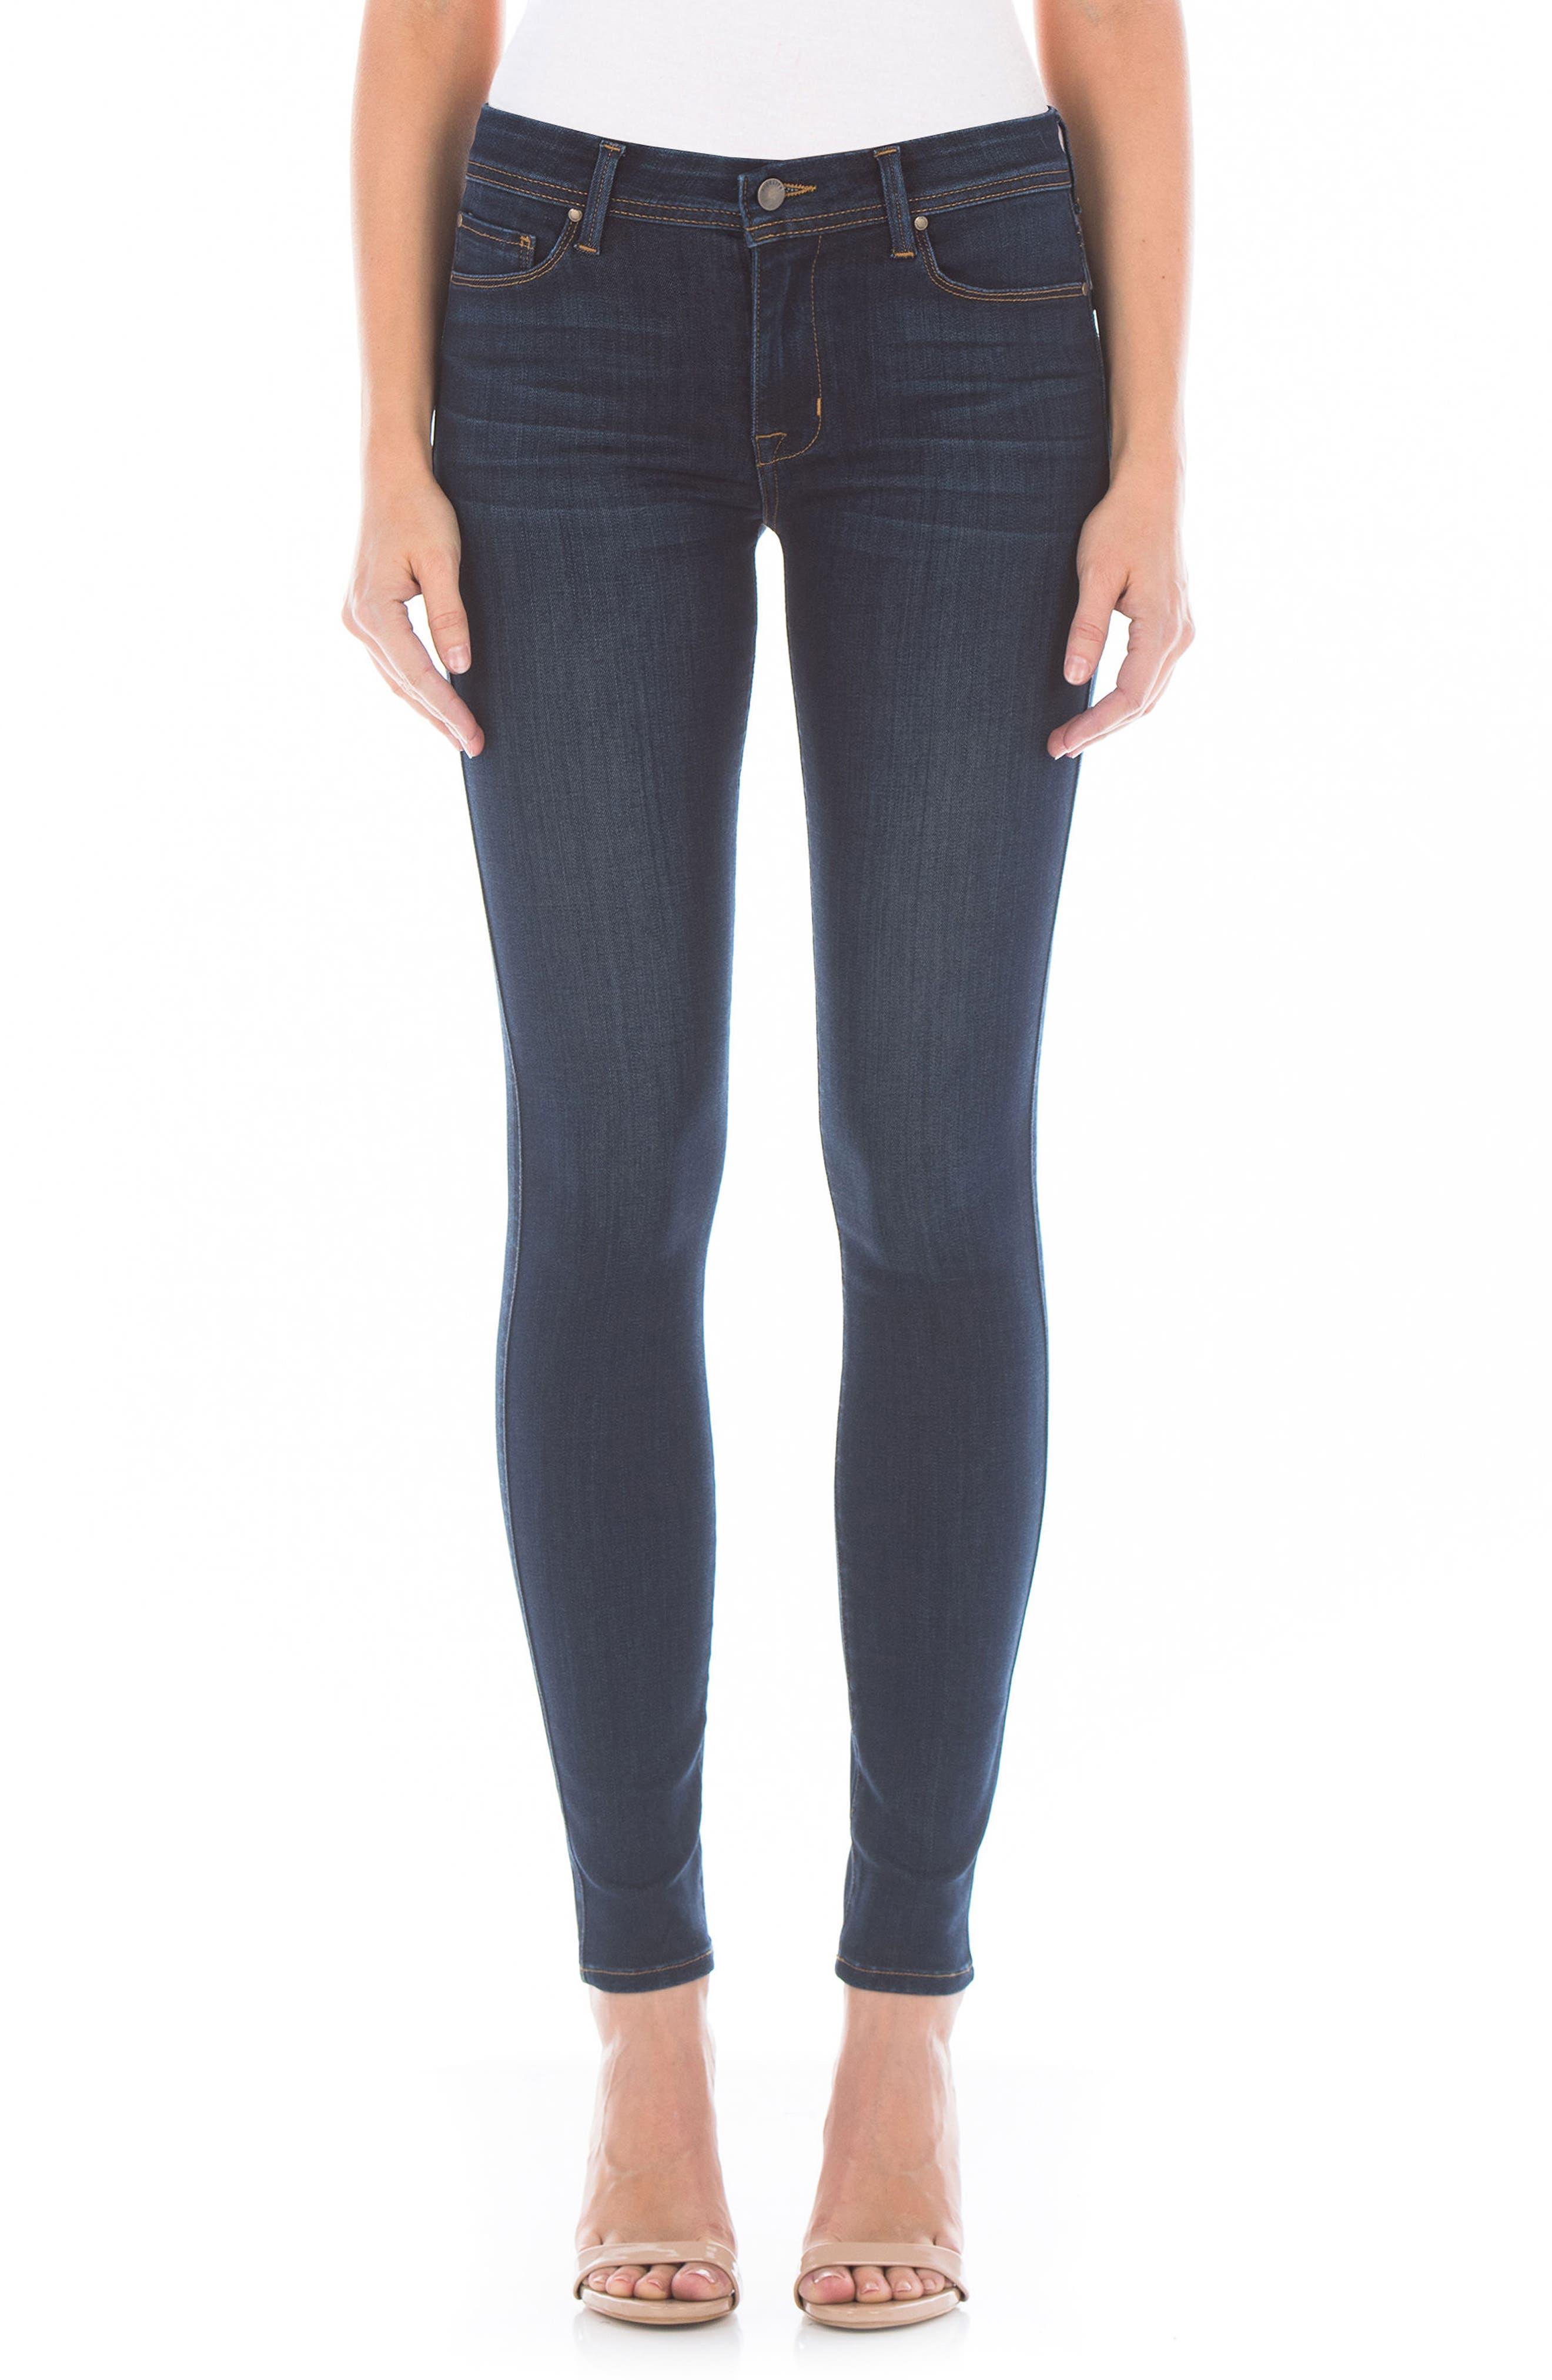 Belvedere Skinny Jeans,                         Main,                         color, 400